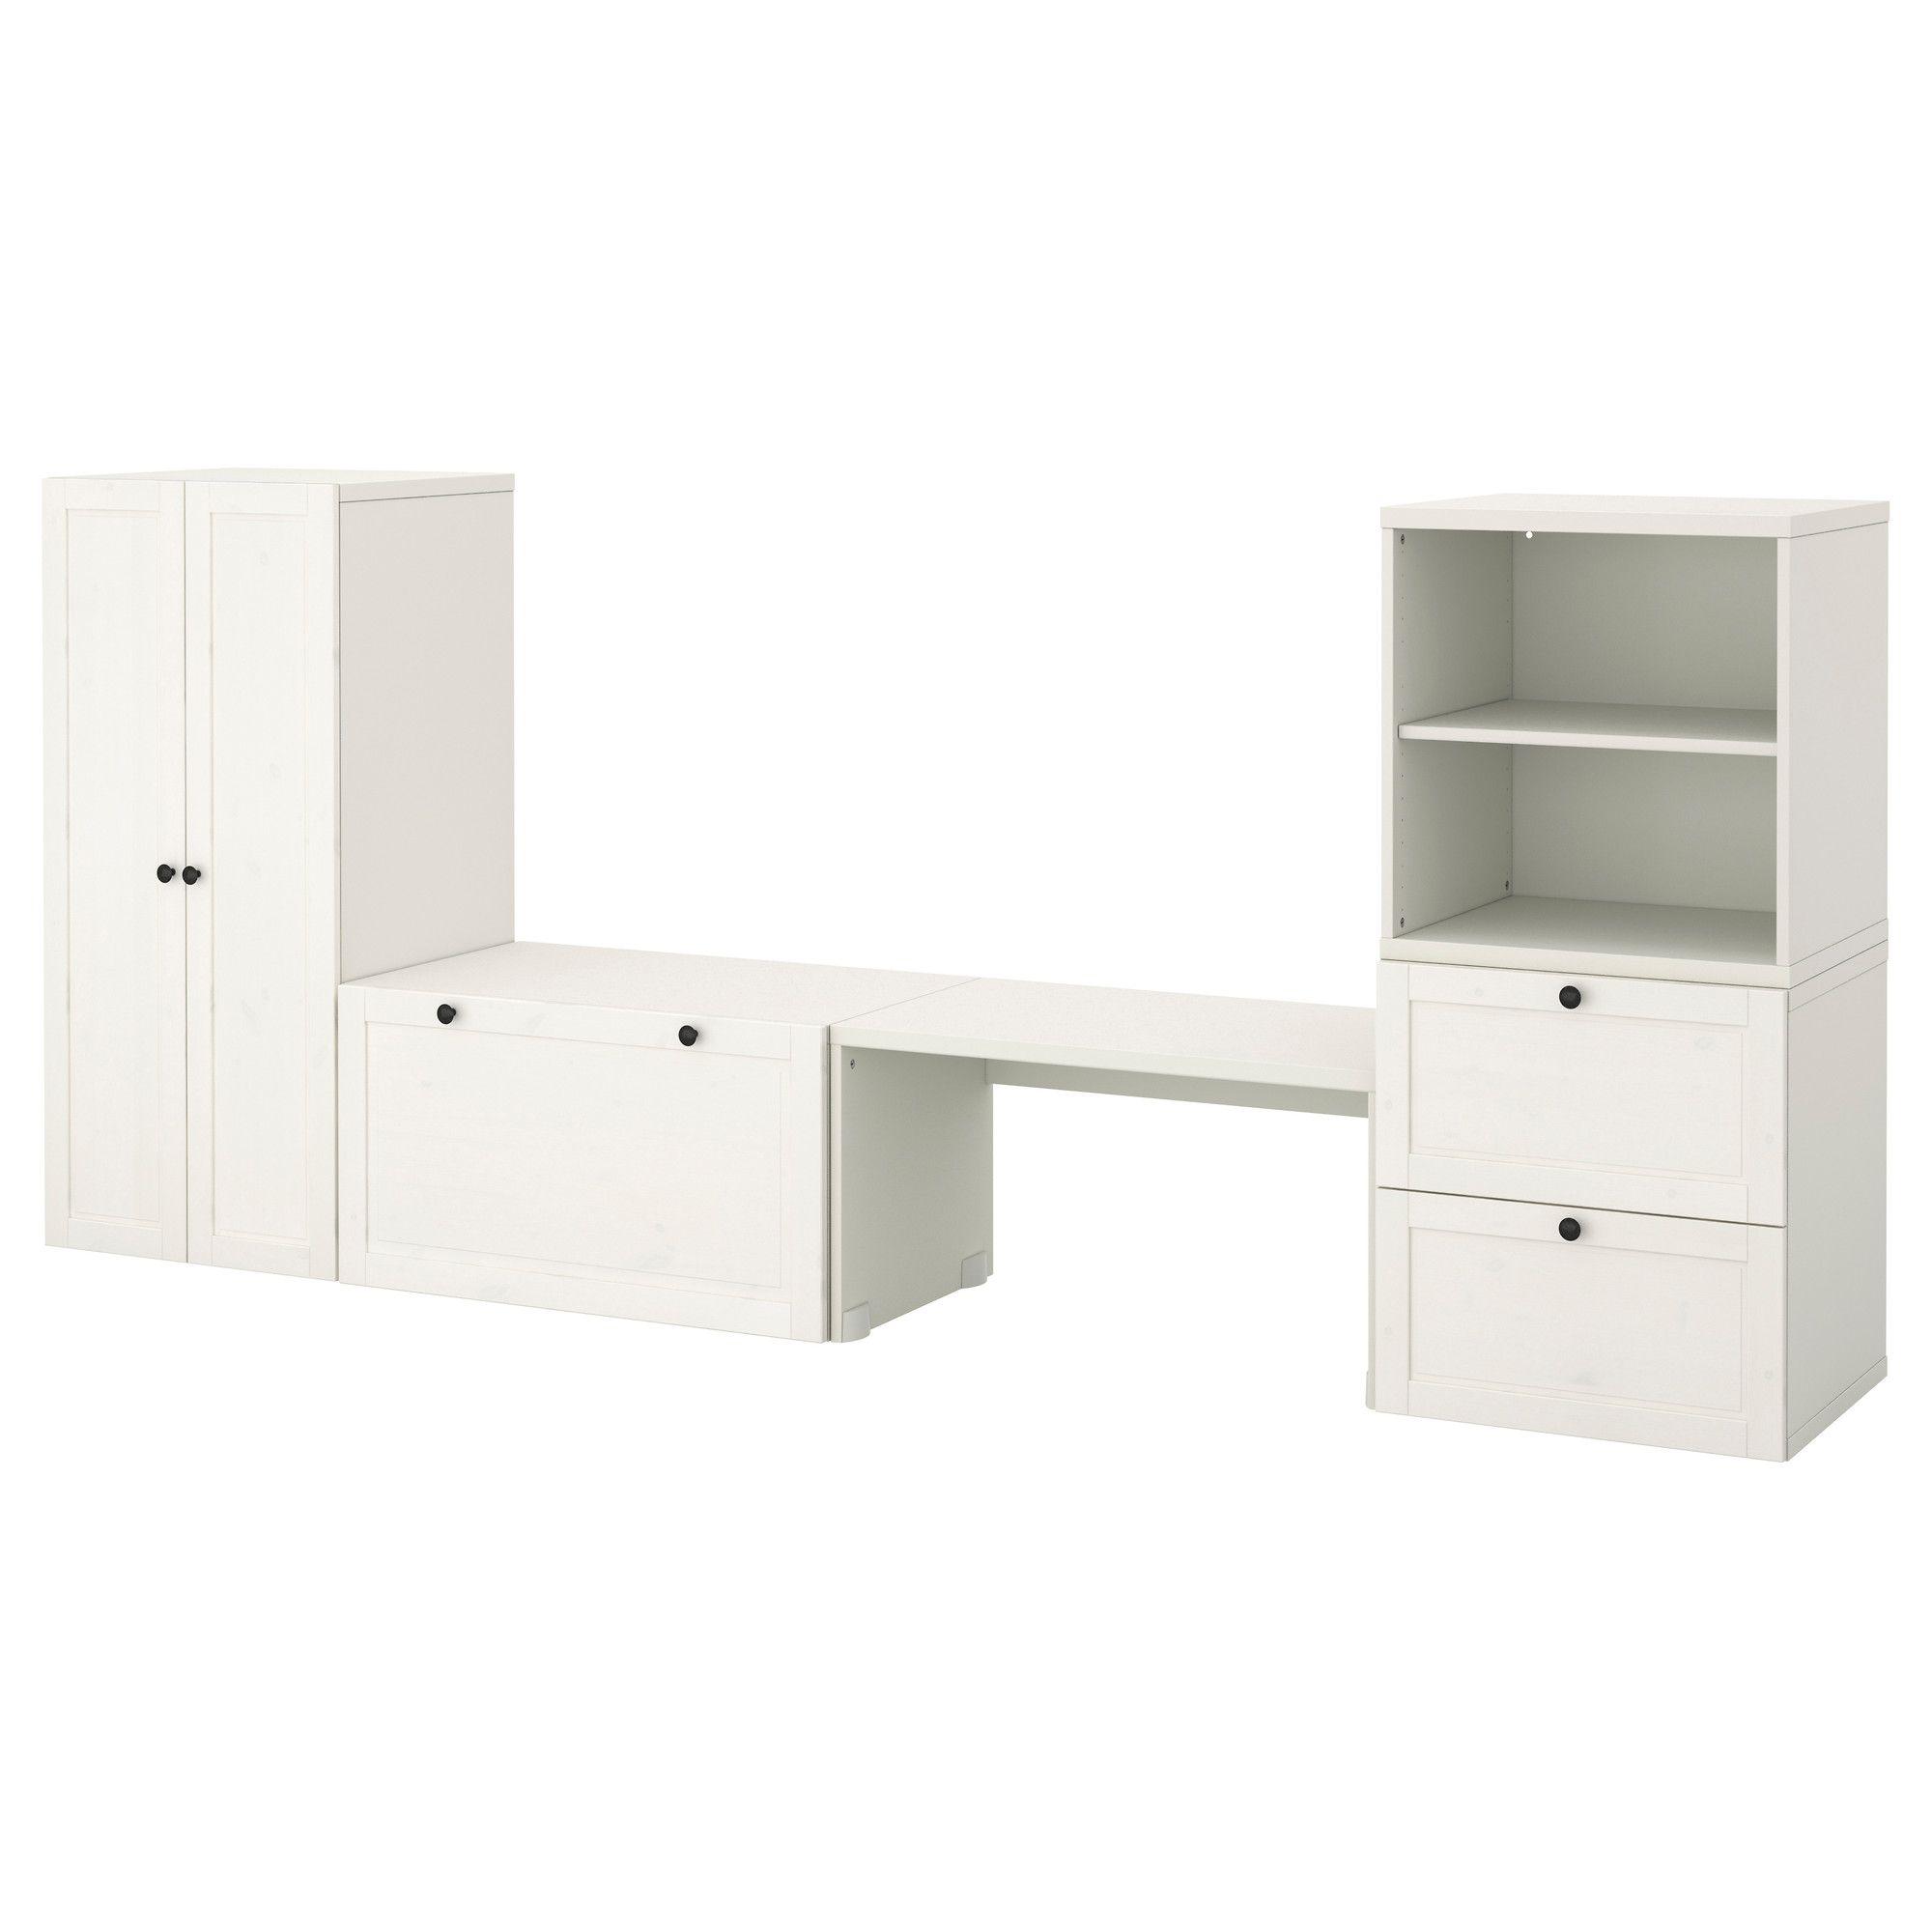 STUVA Förvaringskombination med bänk vitbets IKEA Kids stuff Pinterest